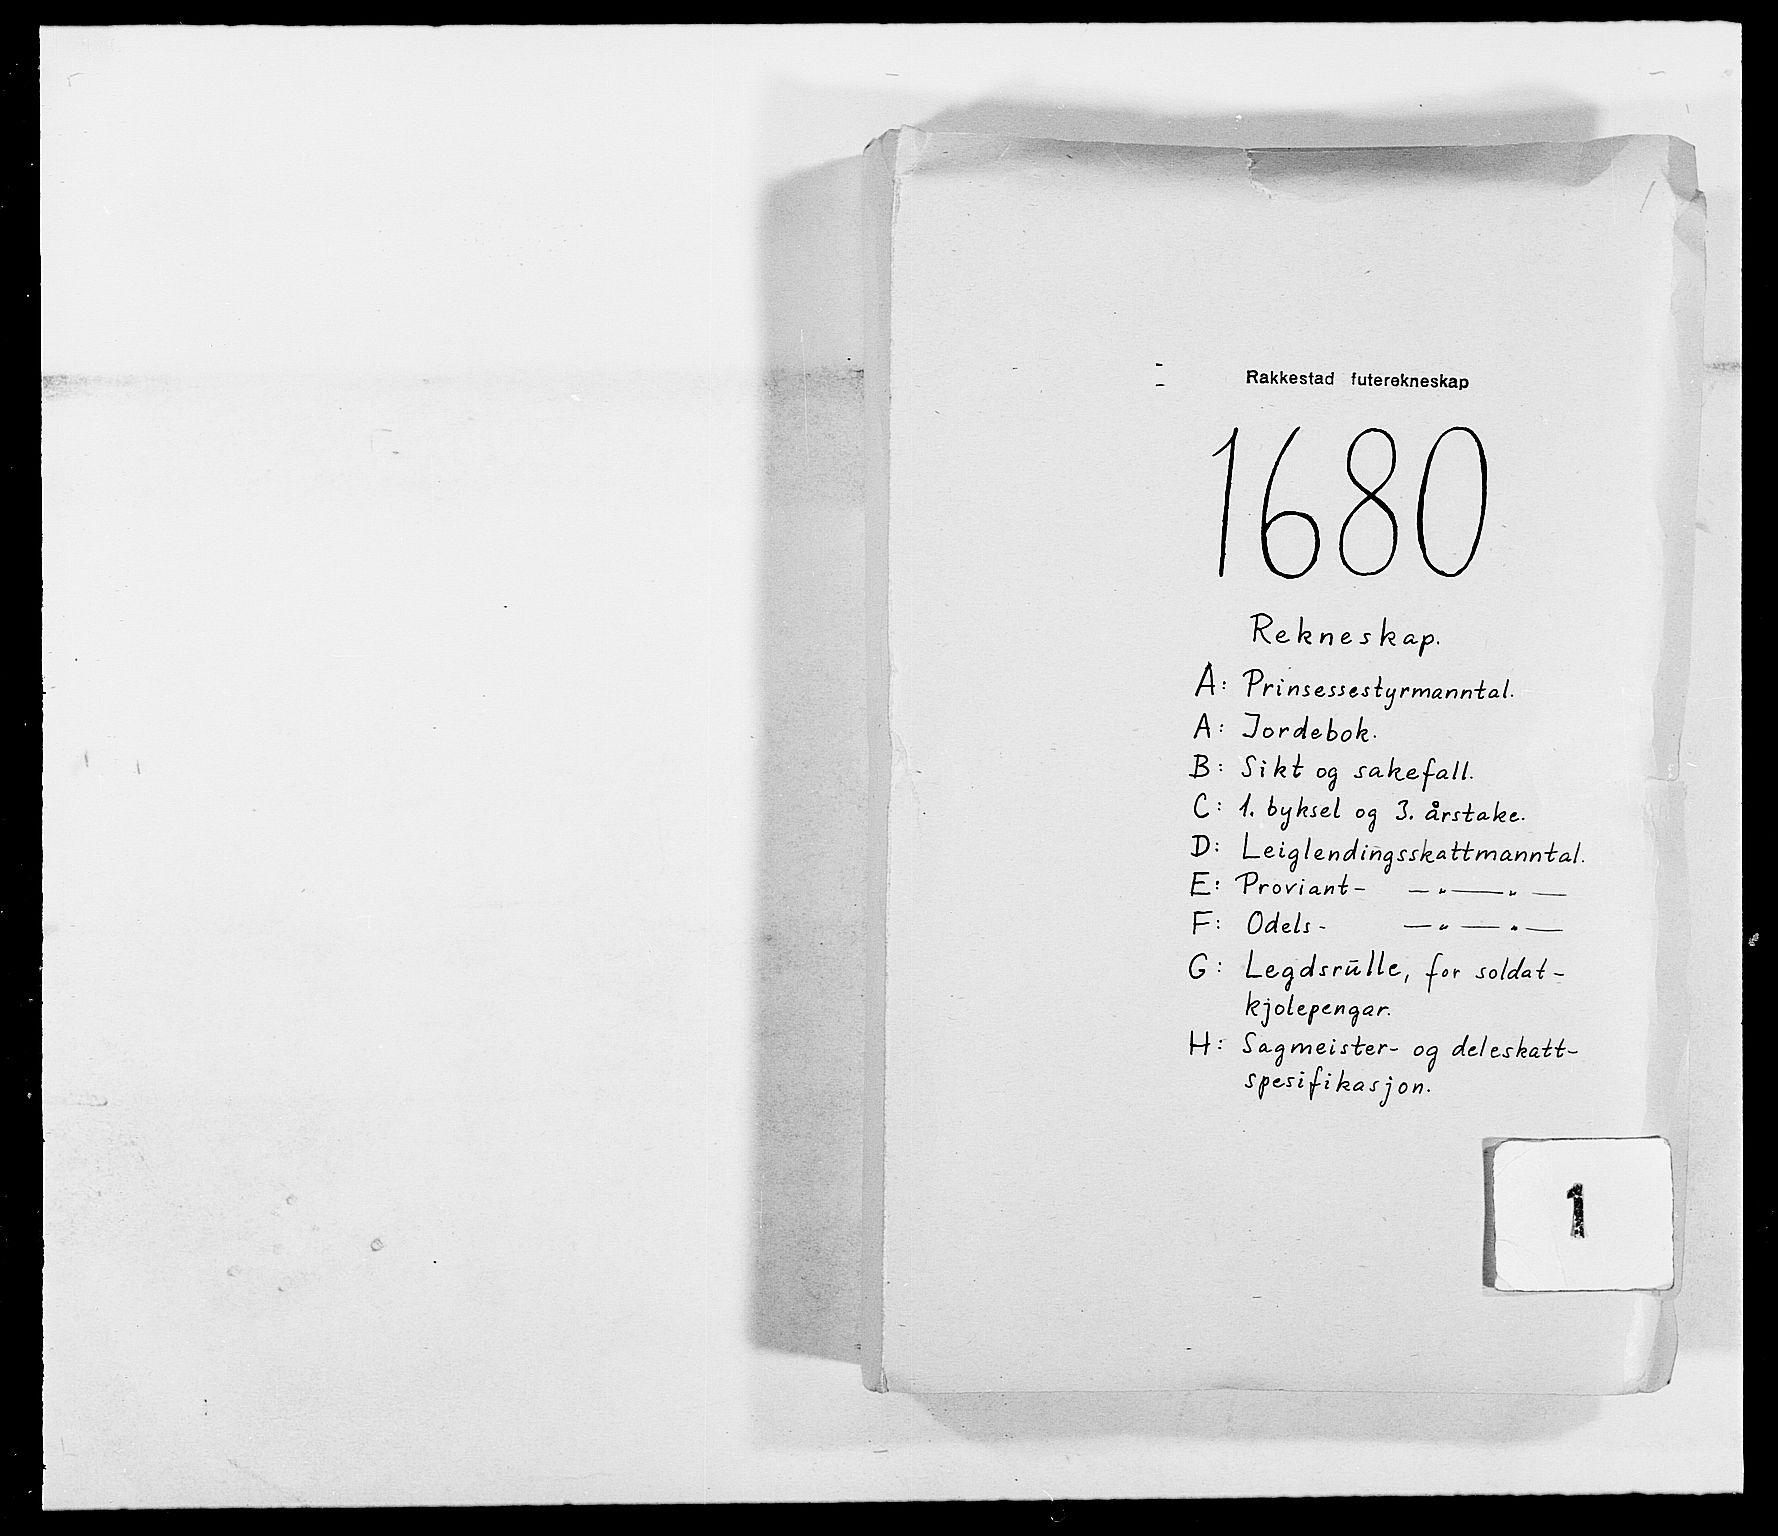 RA, Rentekammeret inntil 1814, Reviderte regnskaper, Fogderegnskap, R05/L0272: Fogderegnskap Rakkestad, 1680-1681, s. 1